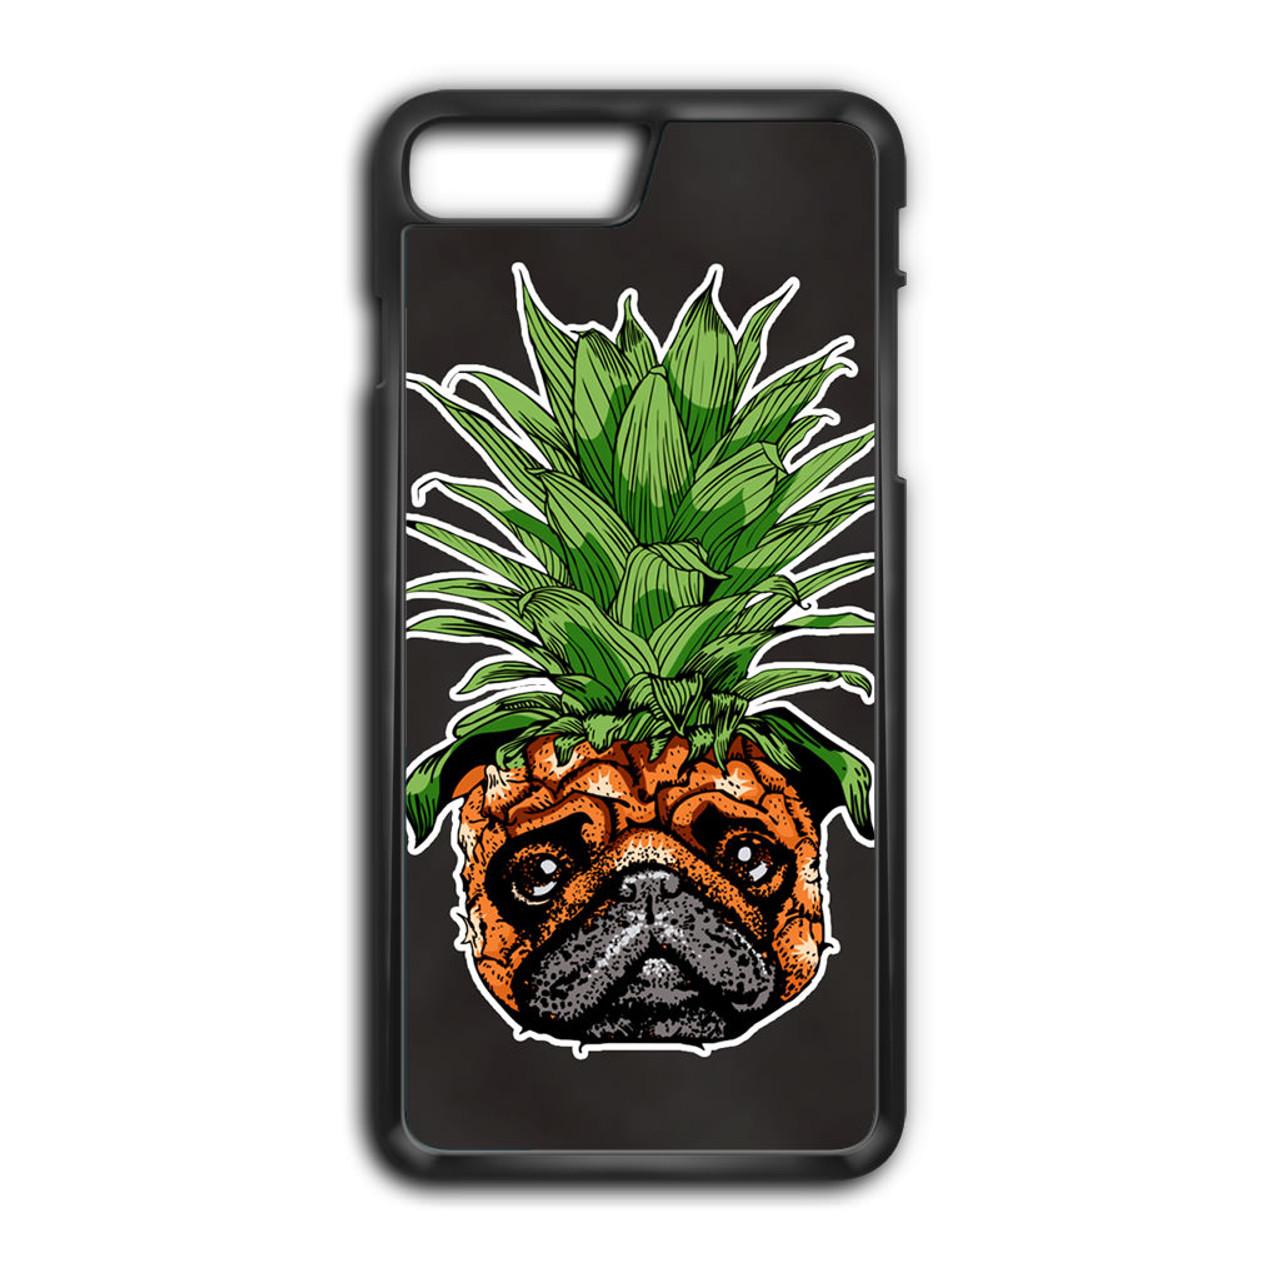 brand new 4a97c 5933b Pineapple Pug iPhone 8 Plus Case